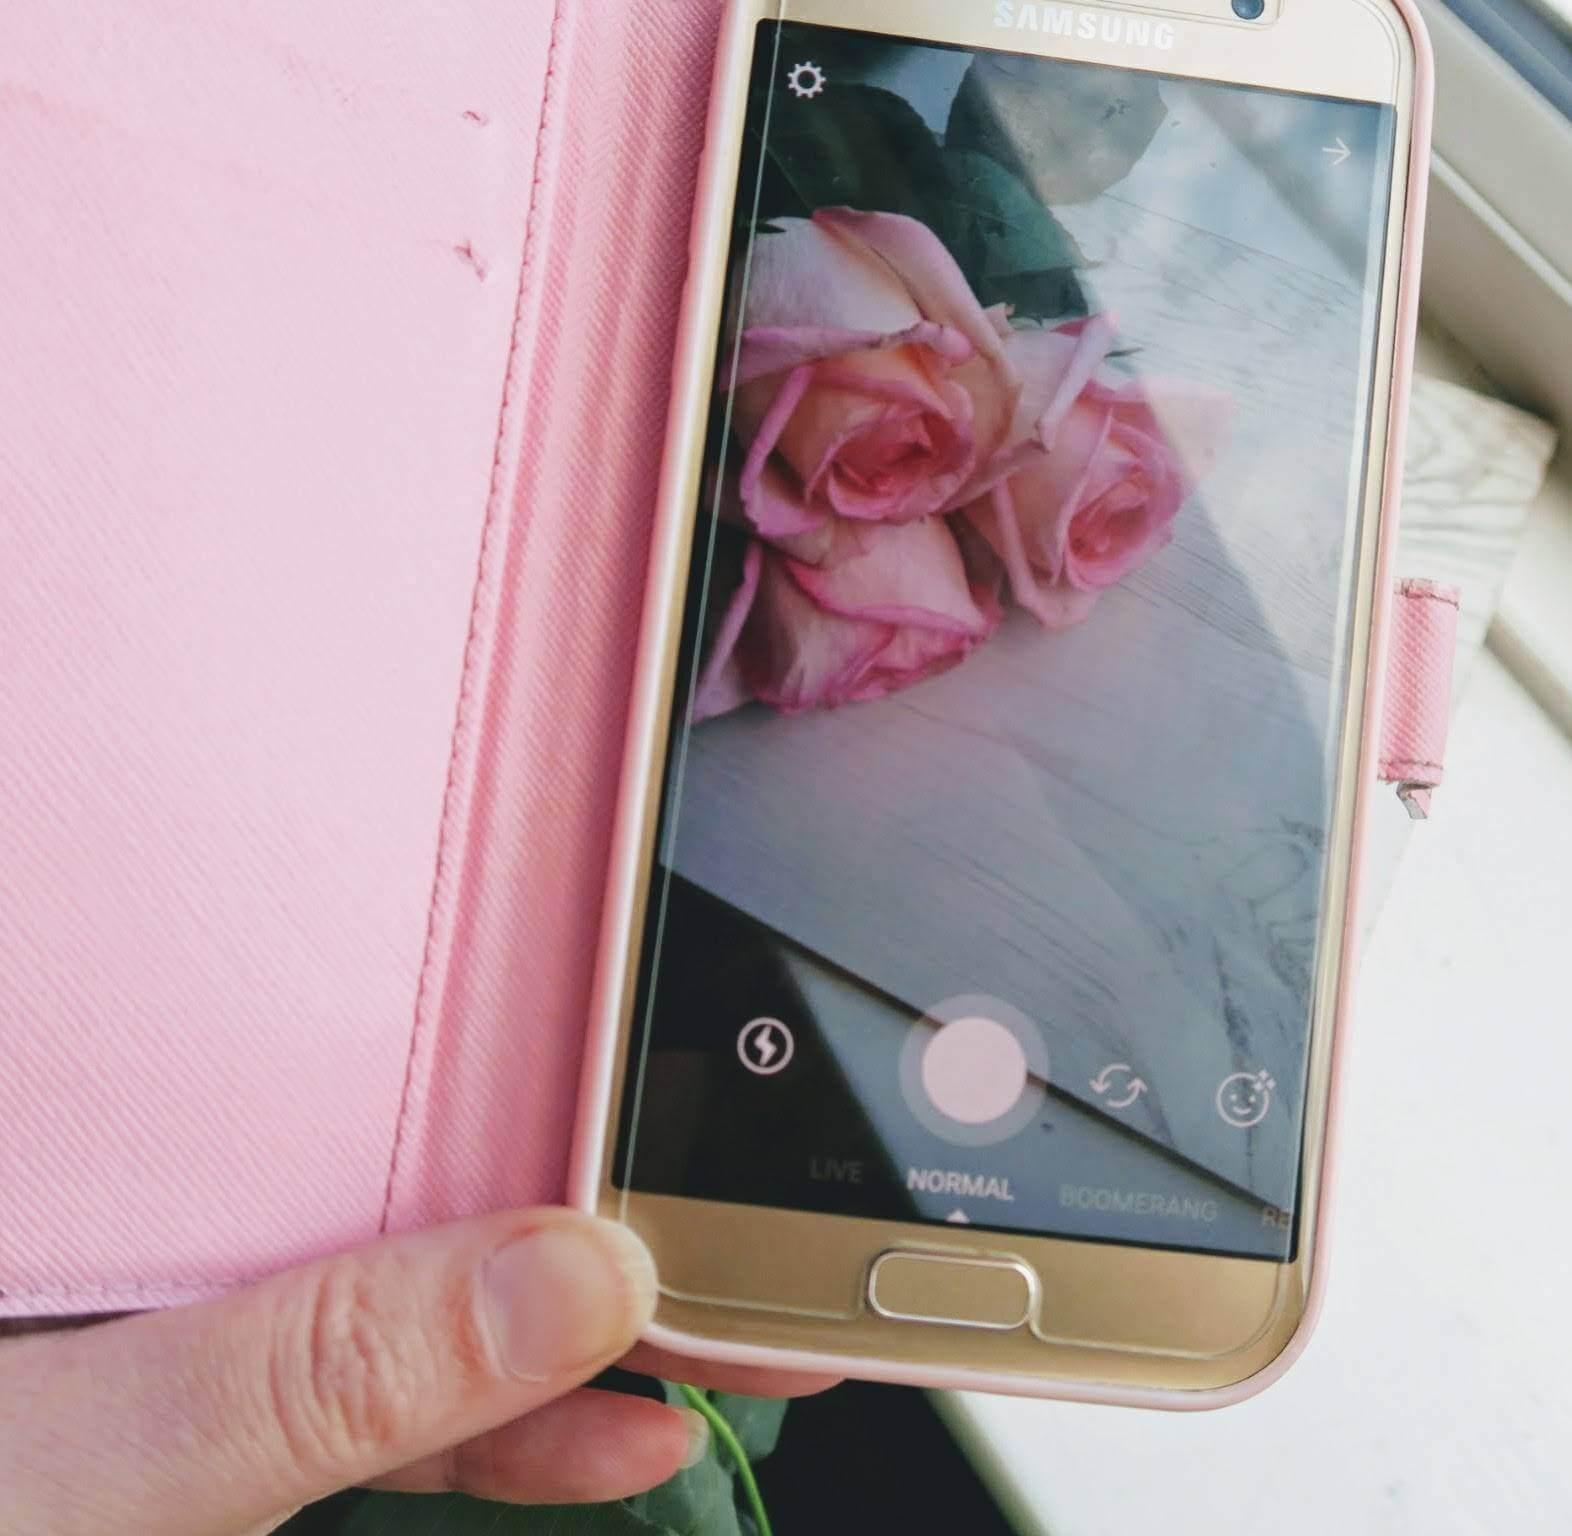 instagram-stories-hacks-tips-grow-followers-audience-midwifeandlife.com